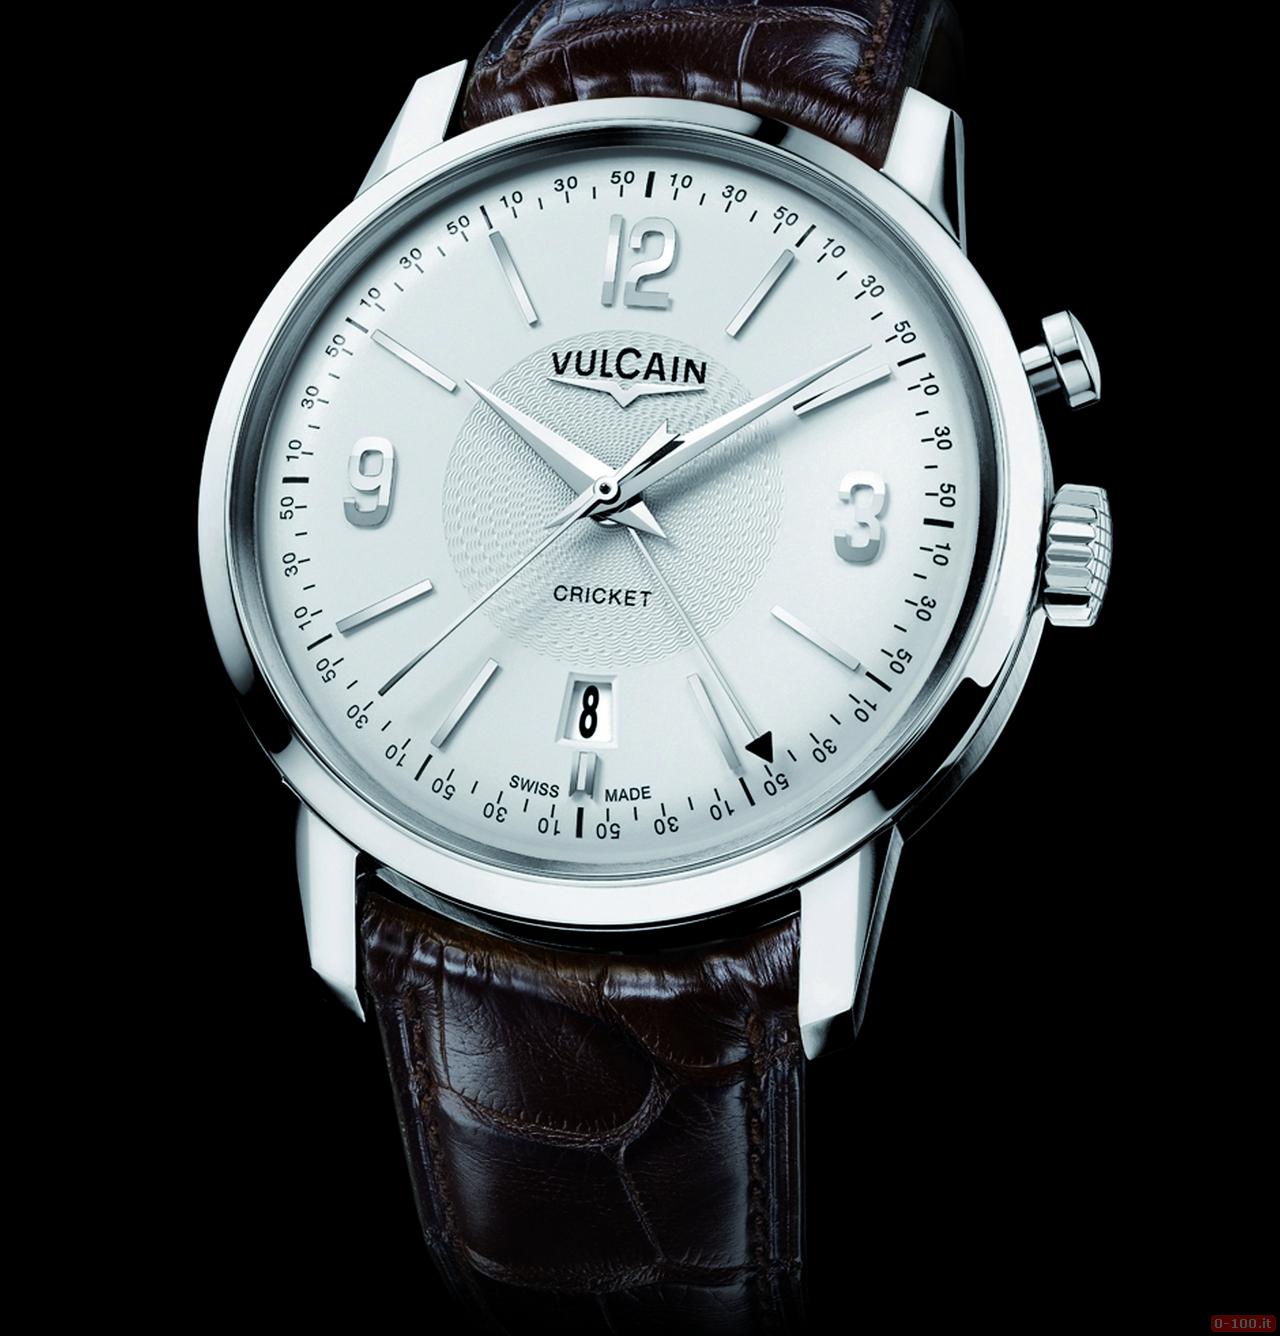 anteprima-baselword-2013-vulcain-50s-presidents-watch_0-100_3